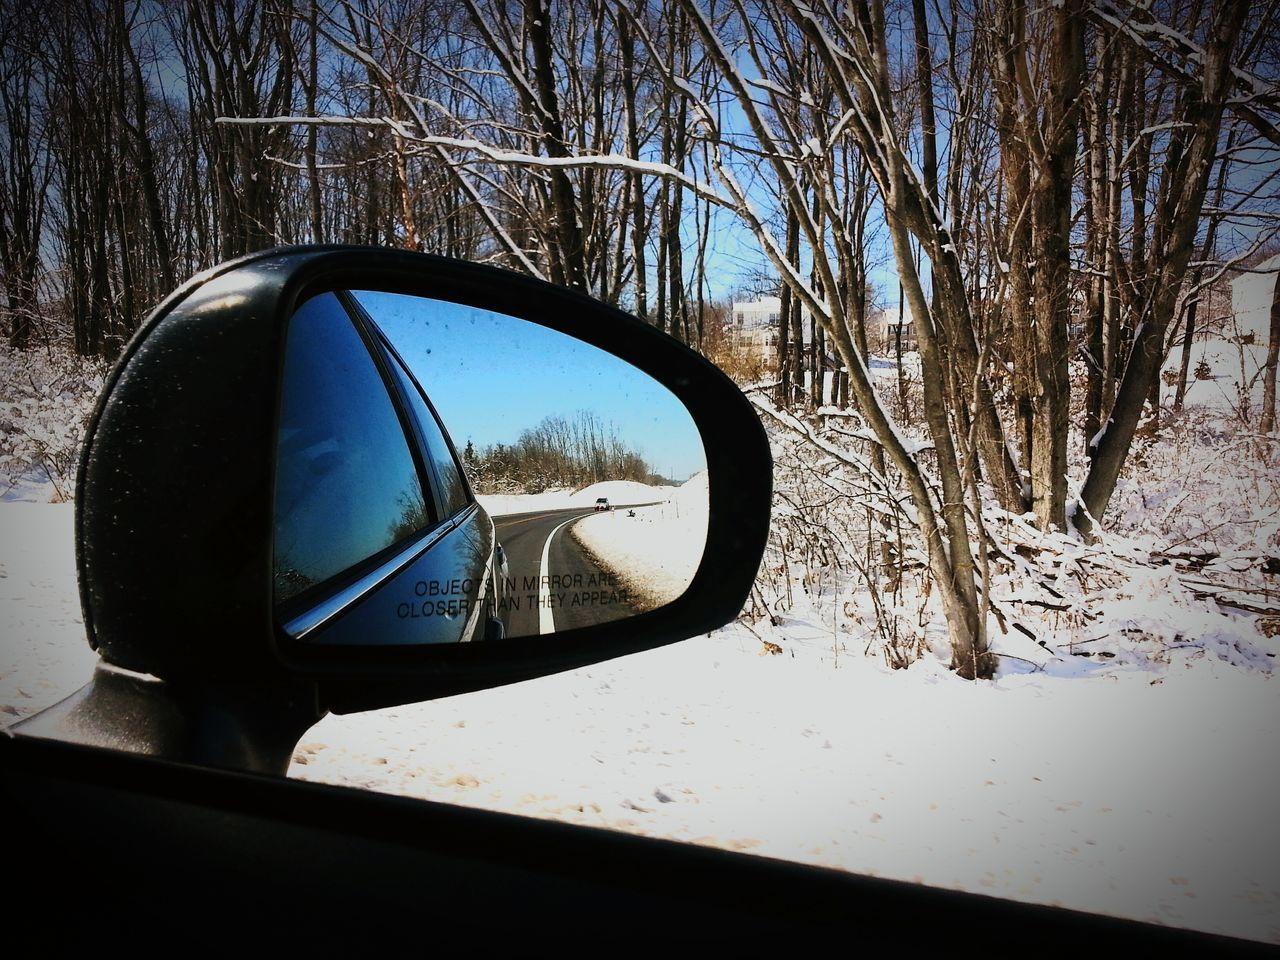 Road Trip Drivingshots Longdrive Snowwhite Rearviewmirror Reflection EyeEm Best Shots The Great Outdoors - 2017 EyeEm Awards